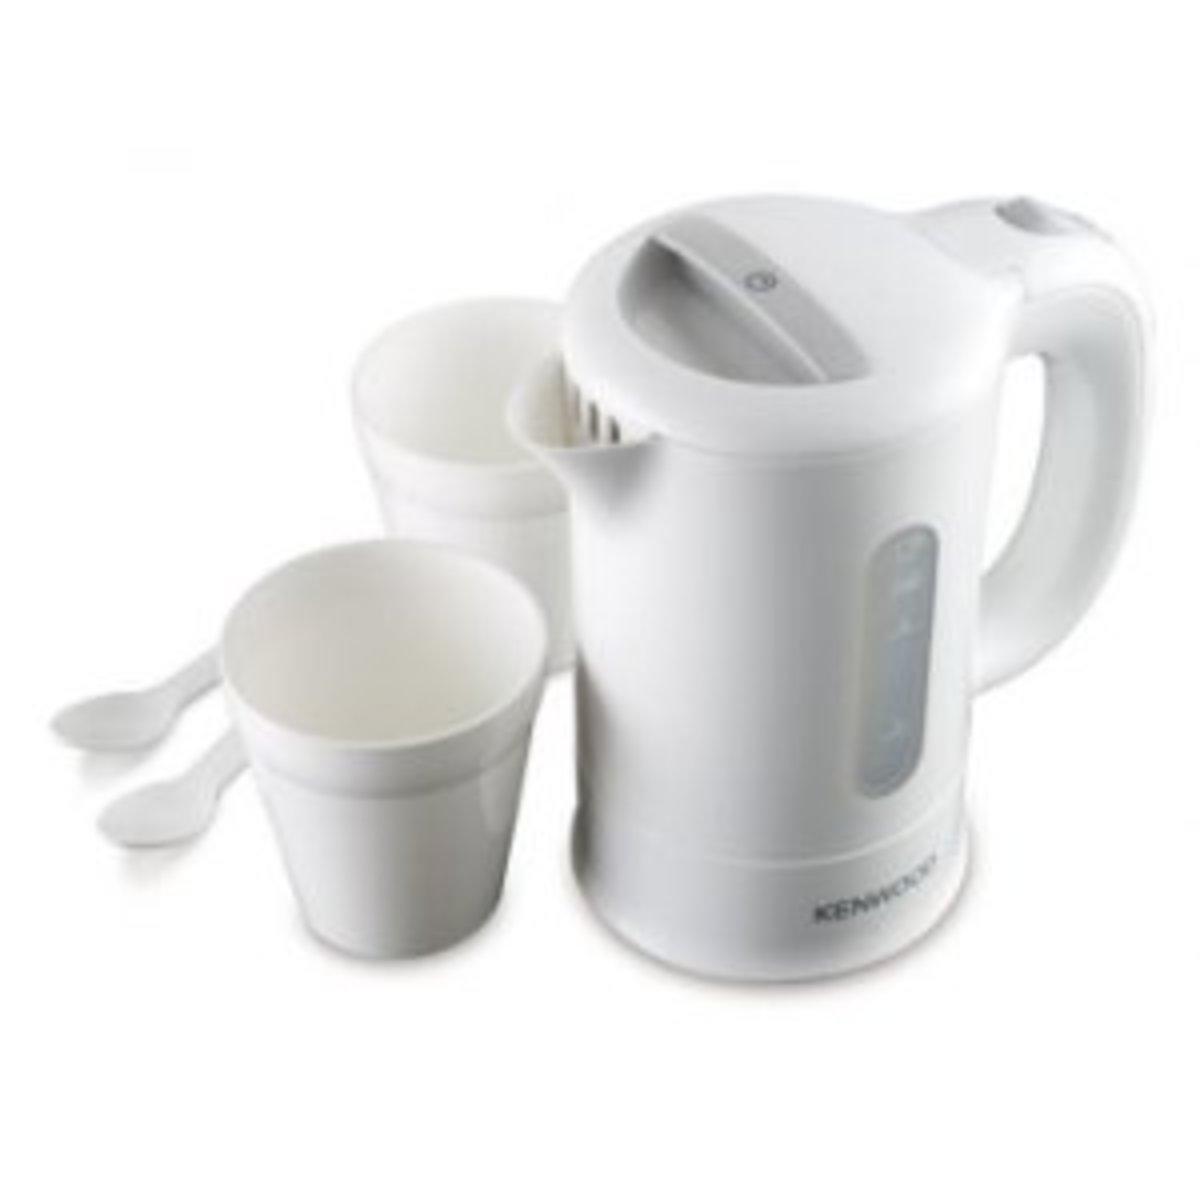 Kenwood JKP250 旅行電熱水壺